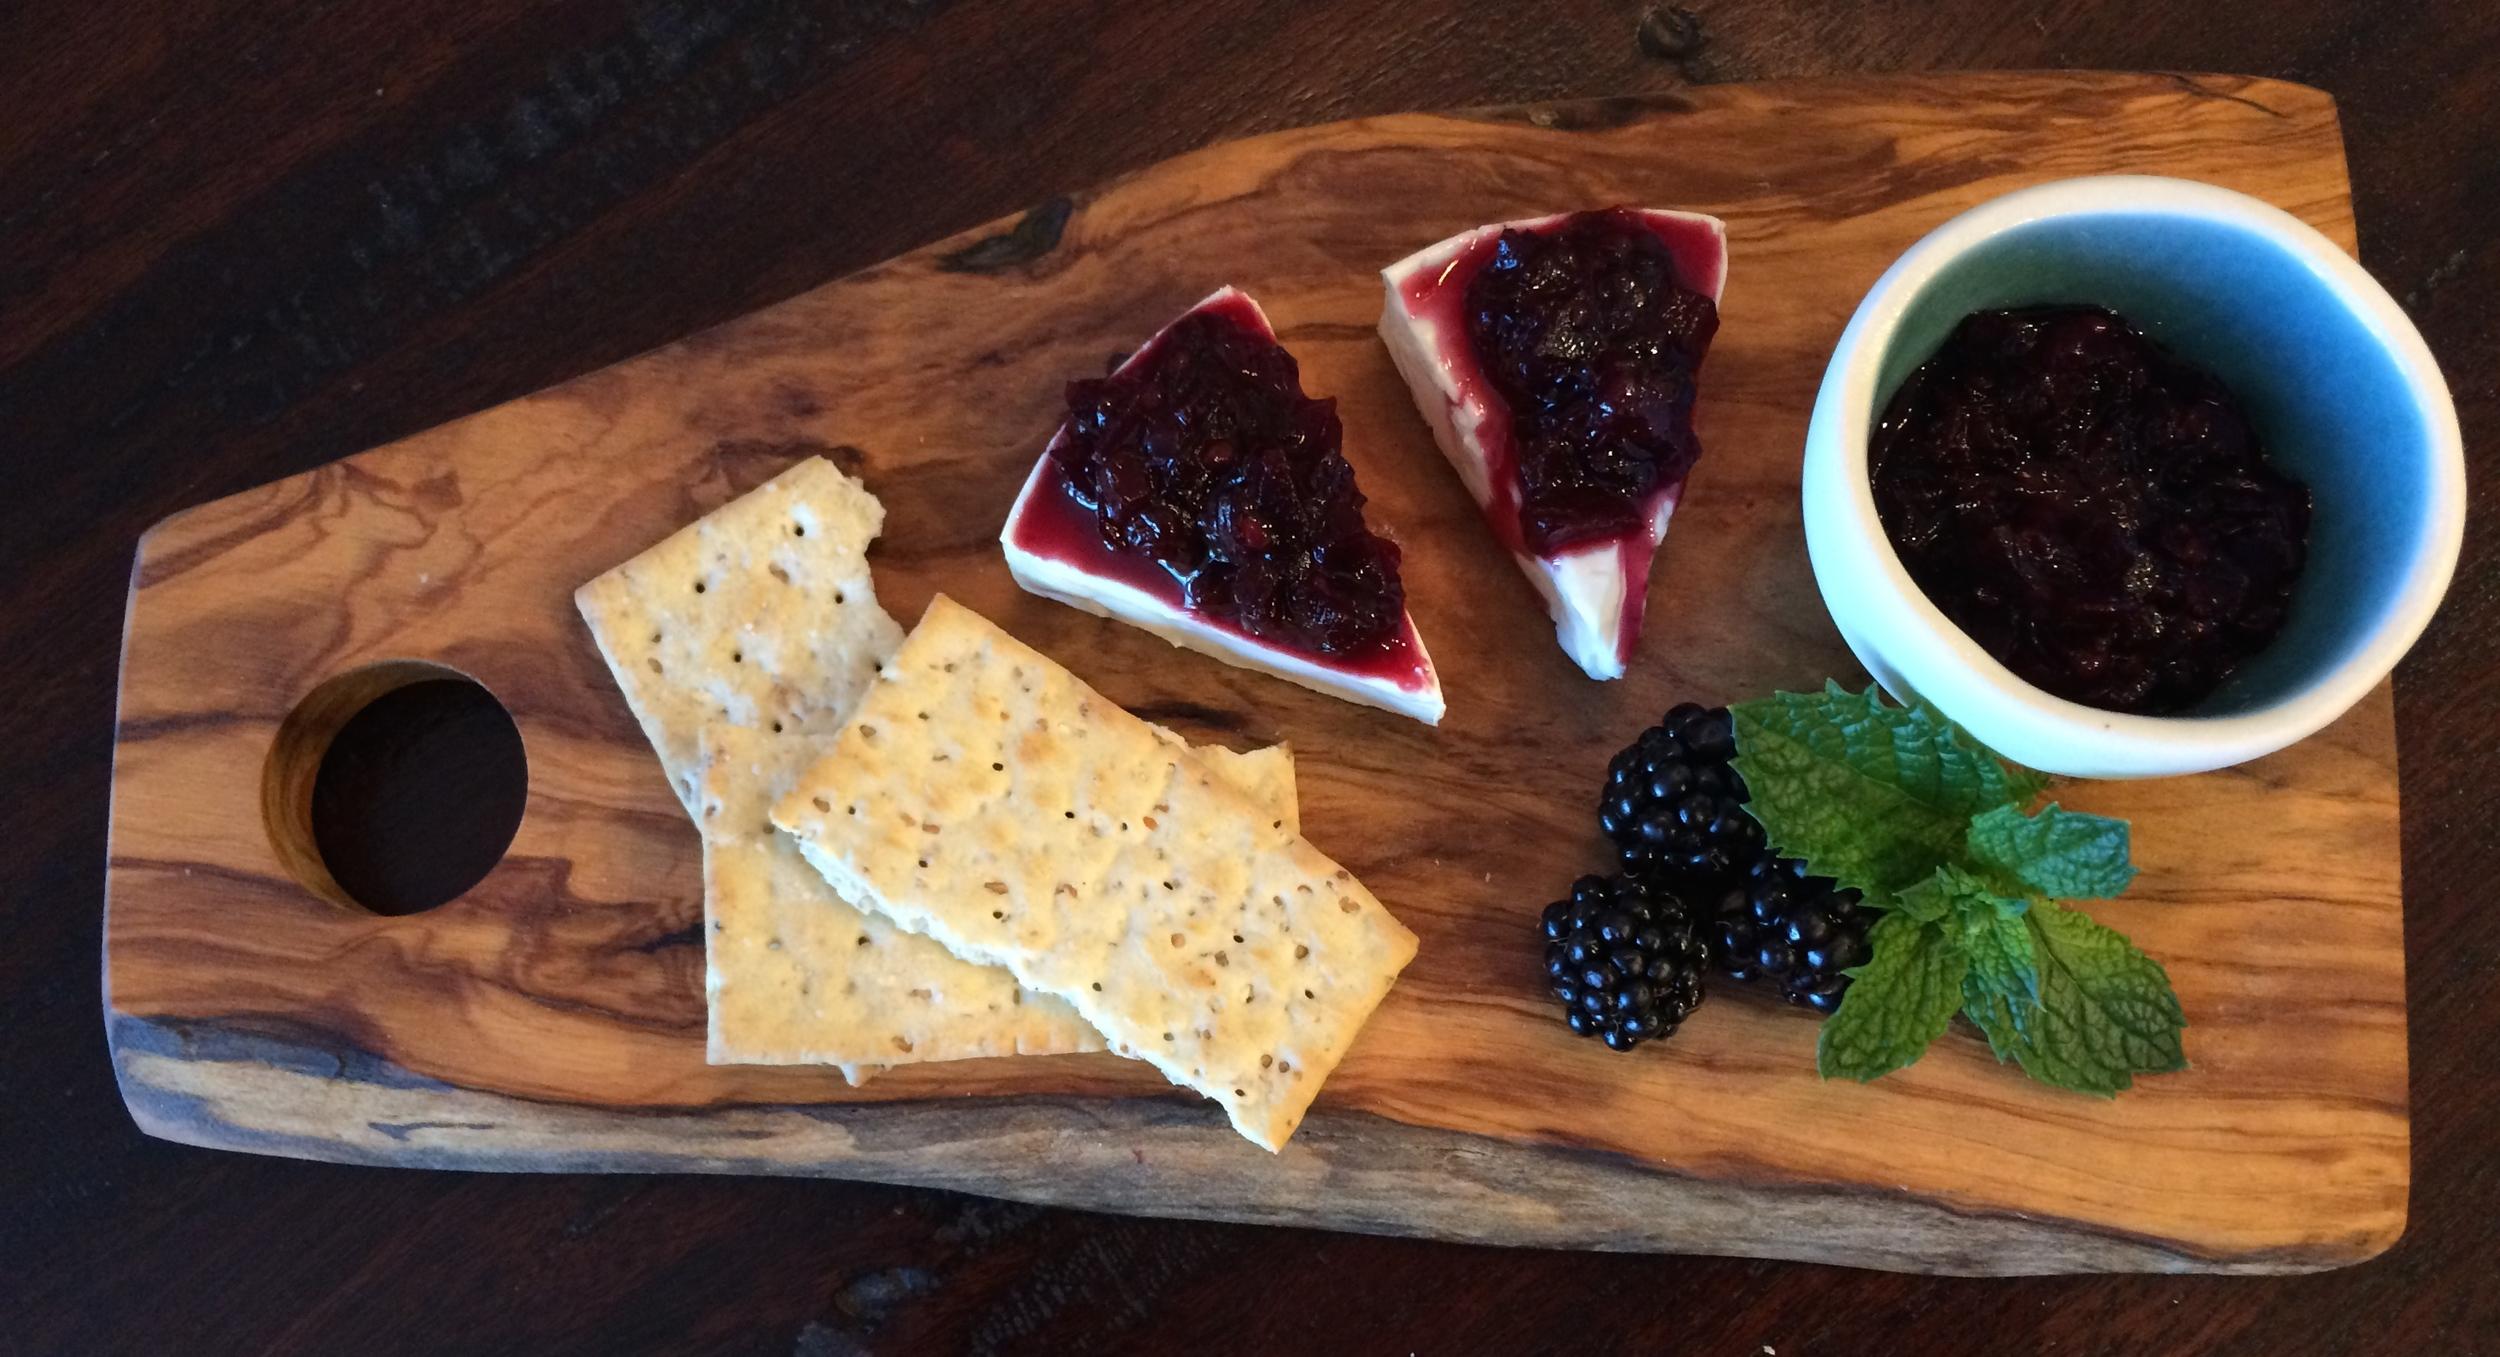 Blackberry Chutney on cream cheese wedges